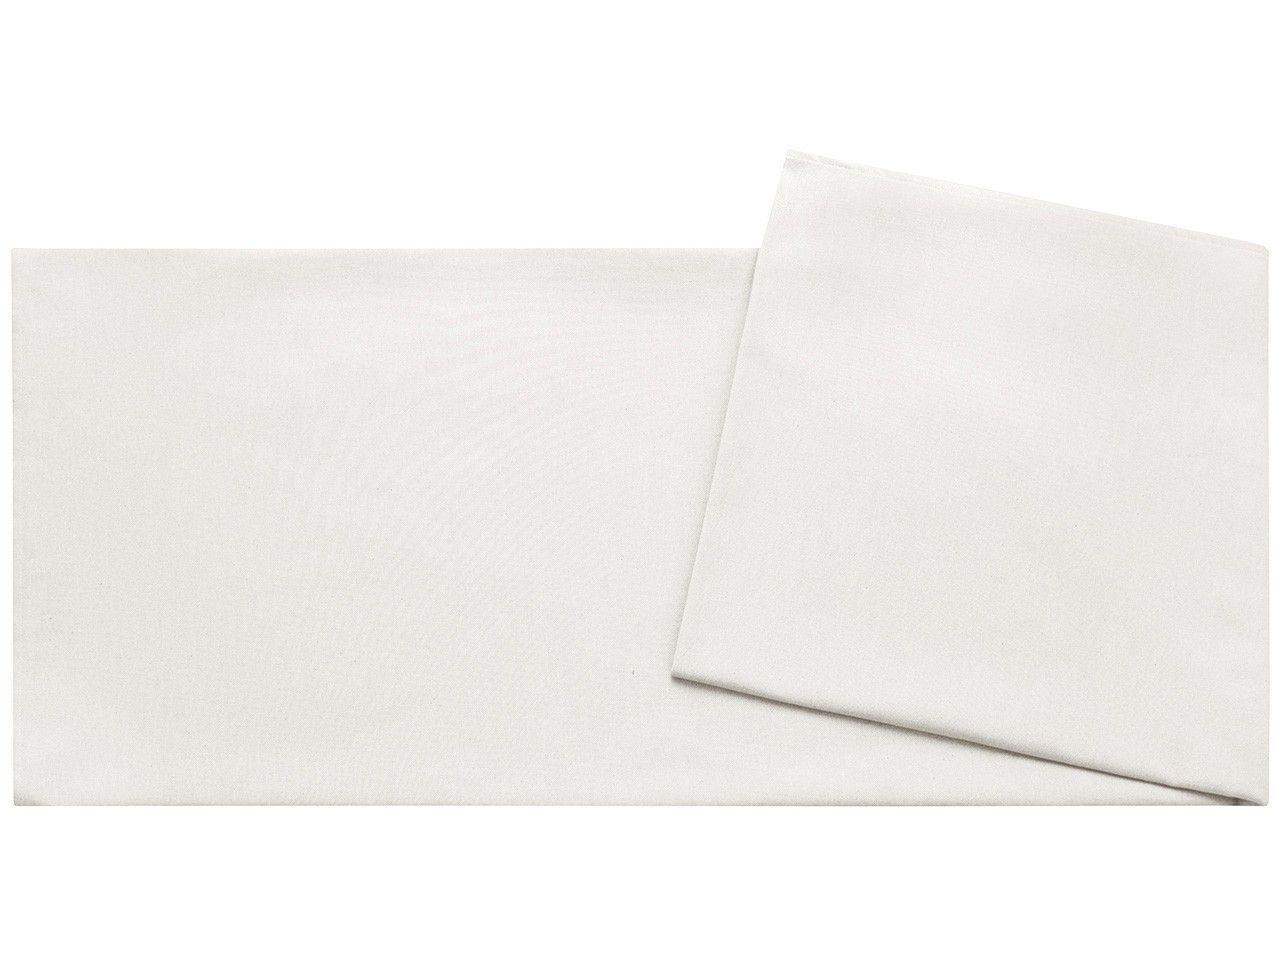 Toalha de Mesa Retangular Naturalle - Branca 180x280cm Off-White